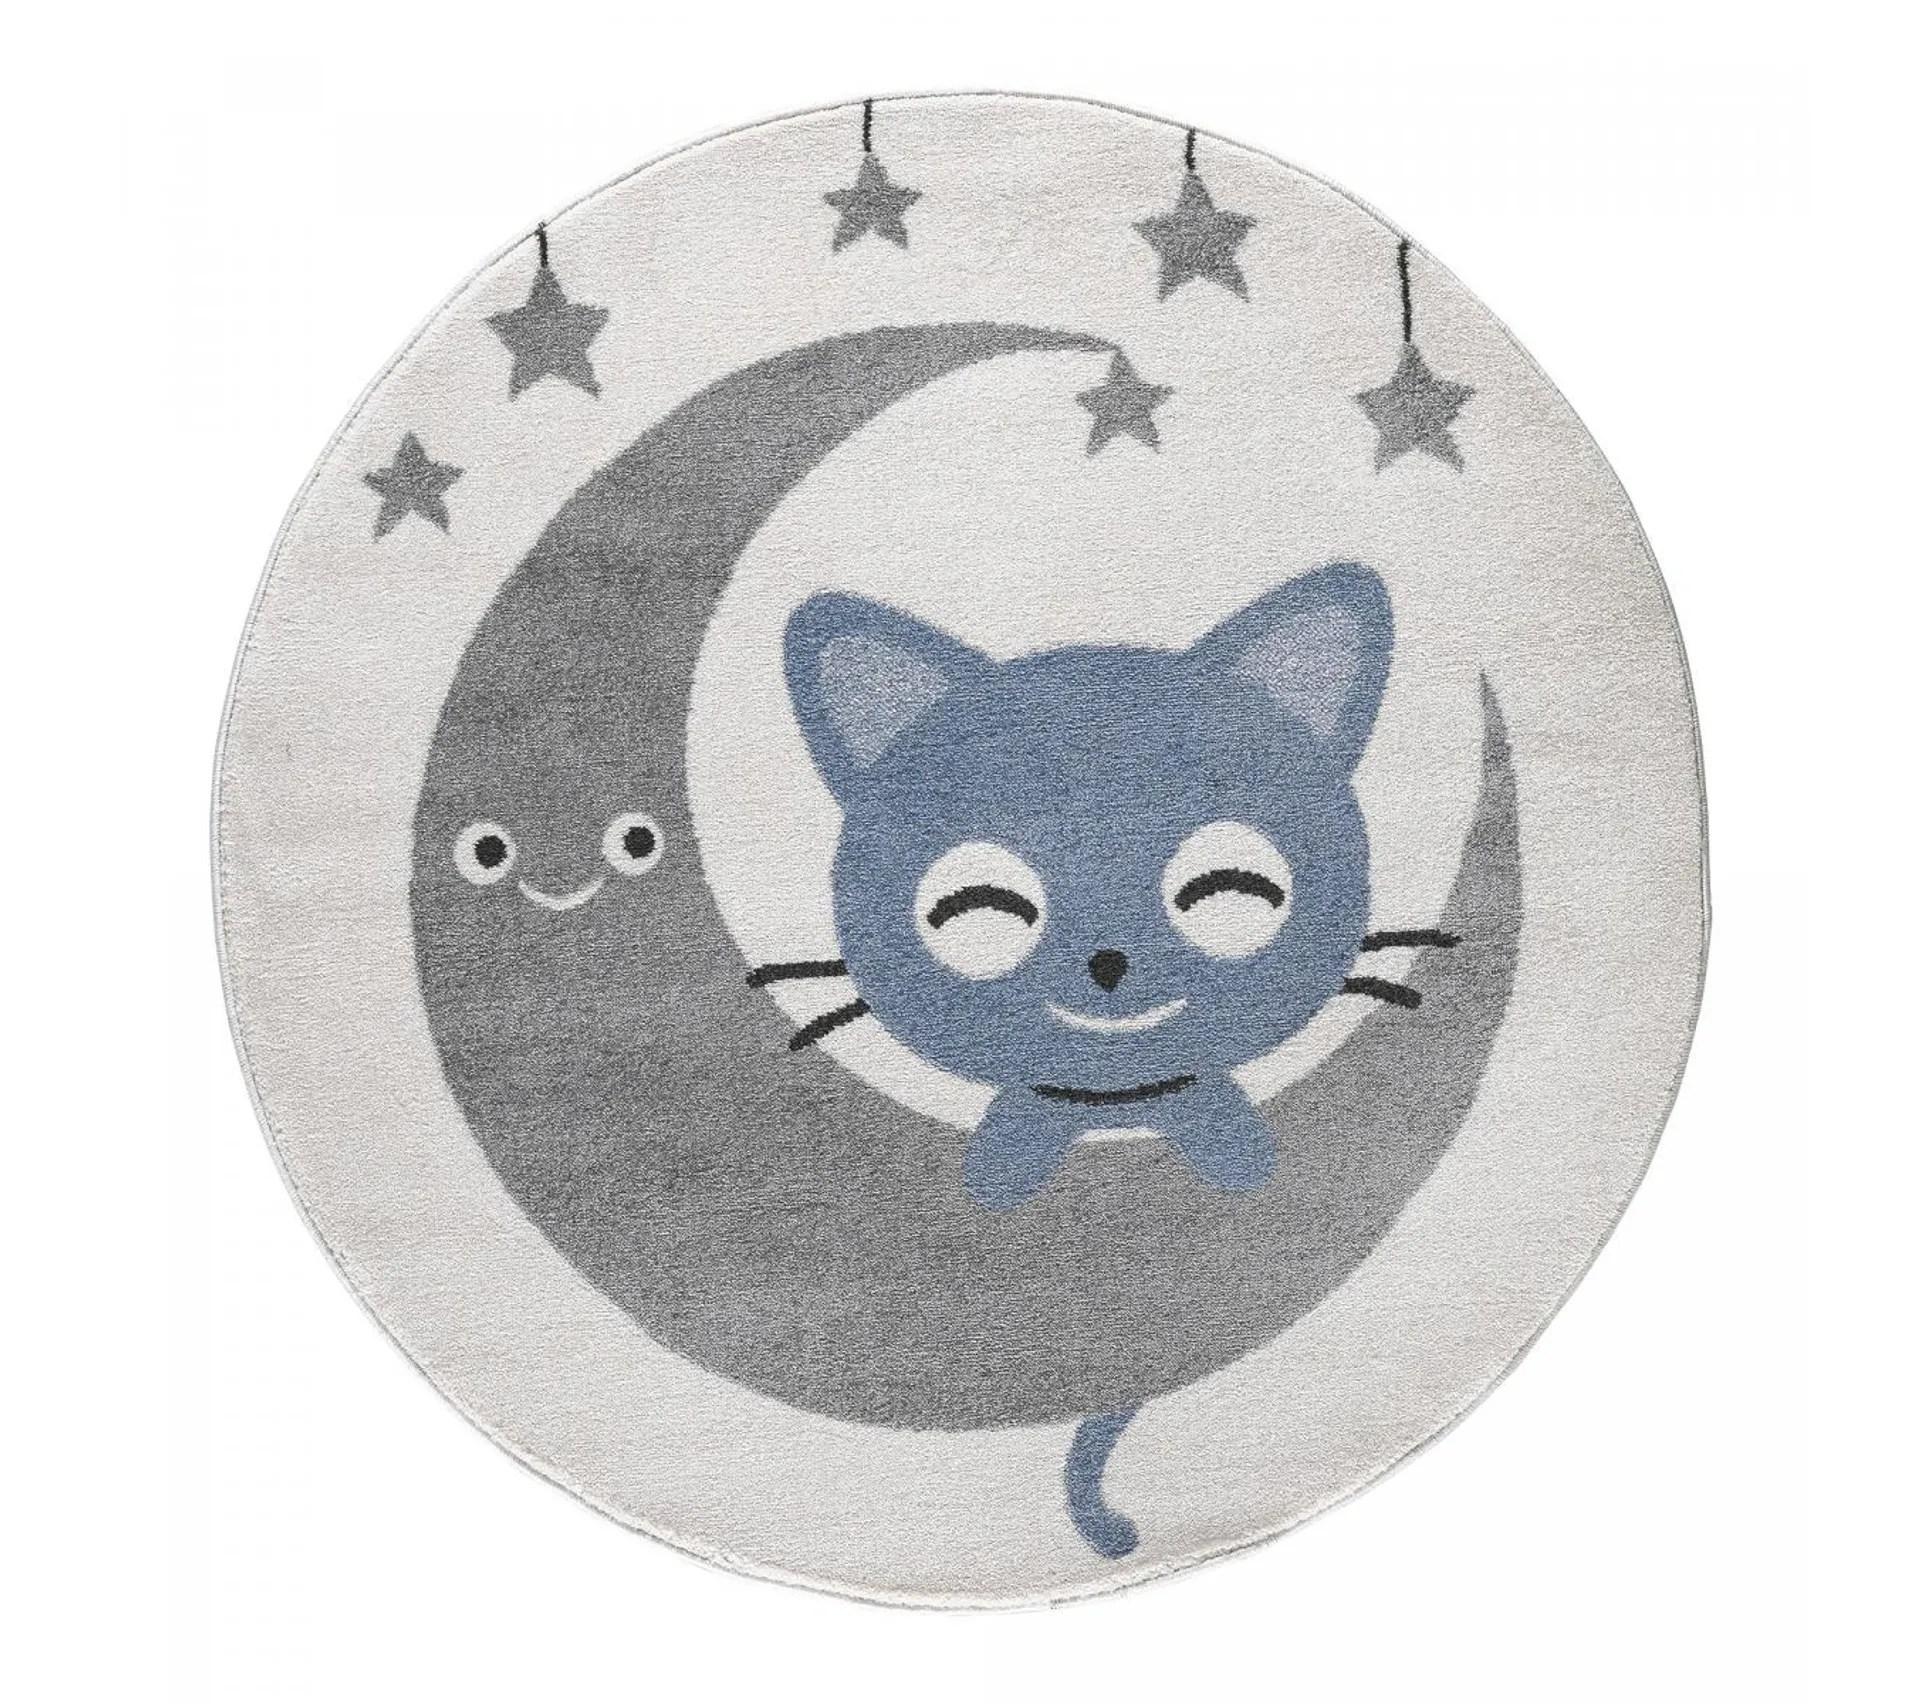 120x120 rond tapis enfant rond candy cat kj gris creme bleu